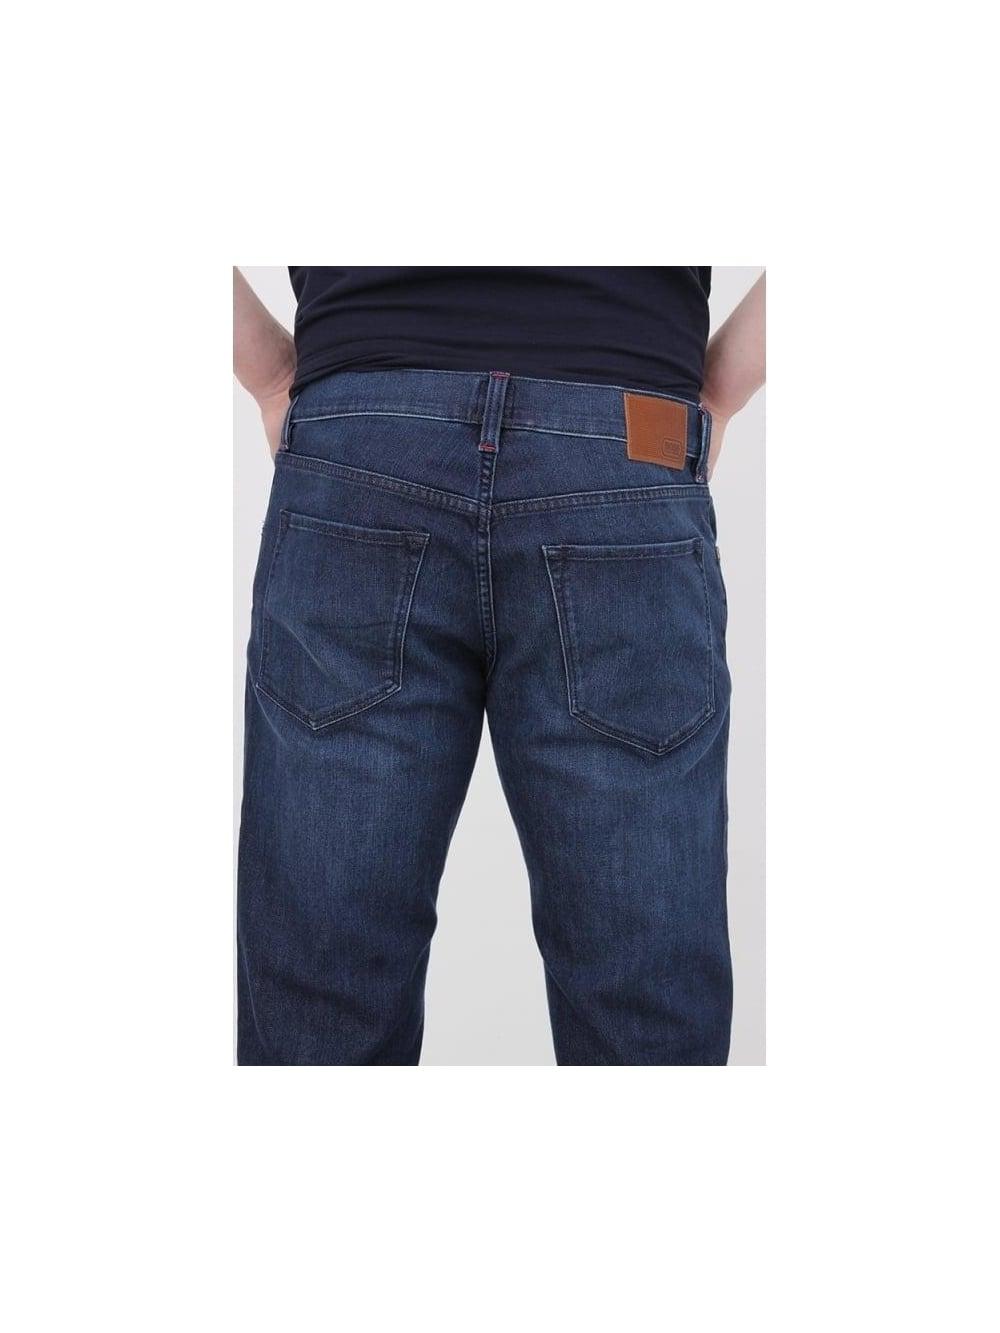 1a42b600889c HUGO BOSS BOSS Green C-Maine 1 Regular Fit Jeans in Navy - Northern ...